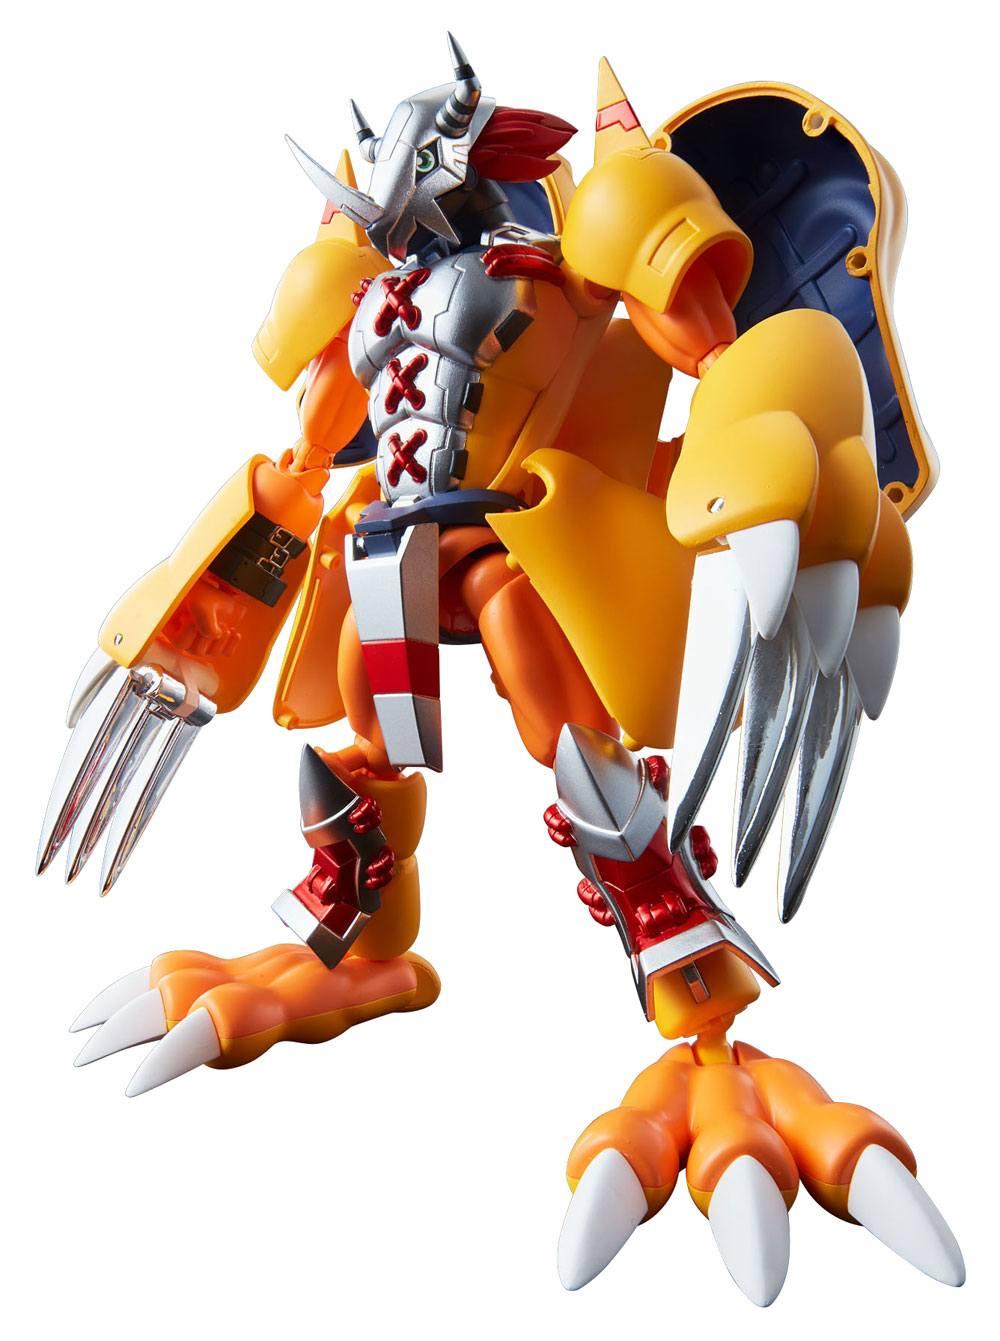 Digimon Adventure Digivolving Spirits Action Figure 01 Wargreymon (Agumon) 16 cm